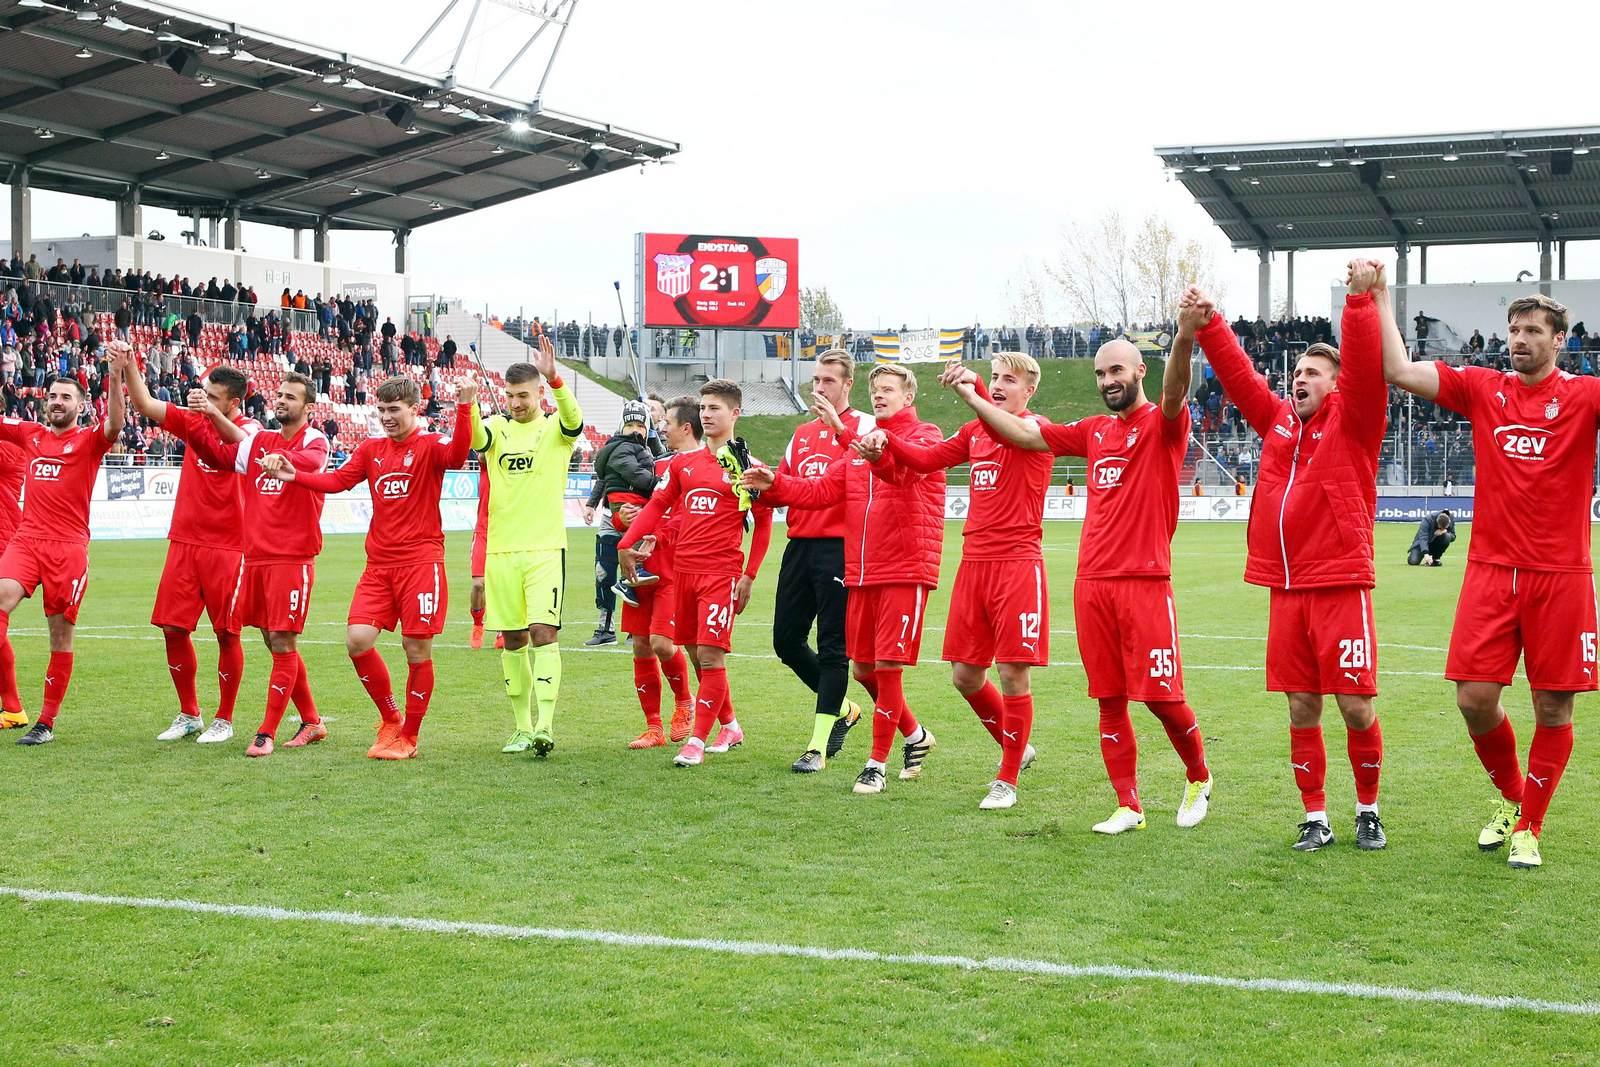 Die Mannschaft des FSV Zwickau feiert vor den Fans.